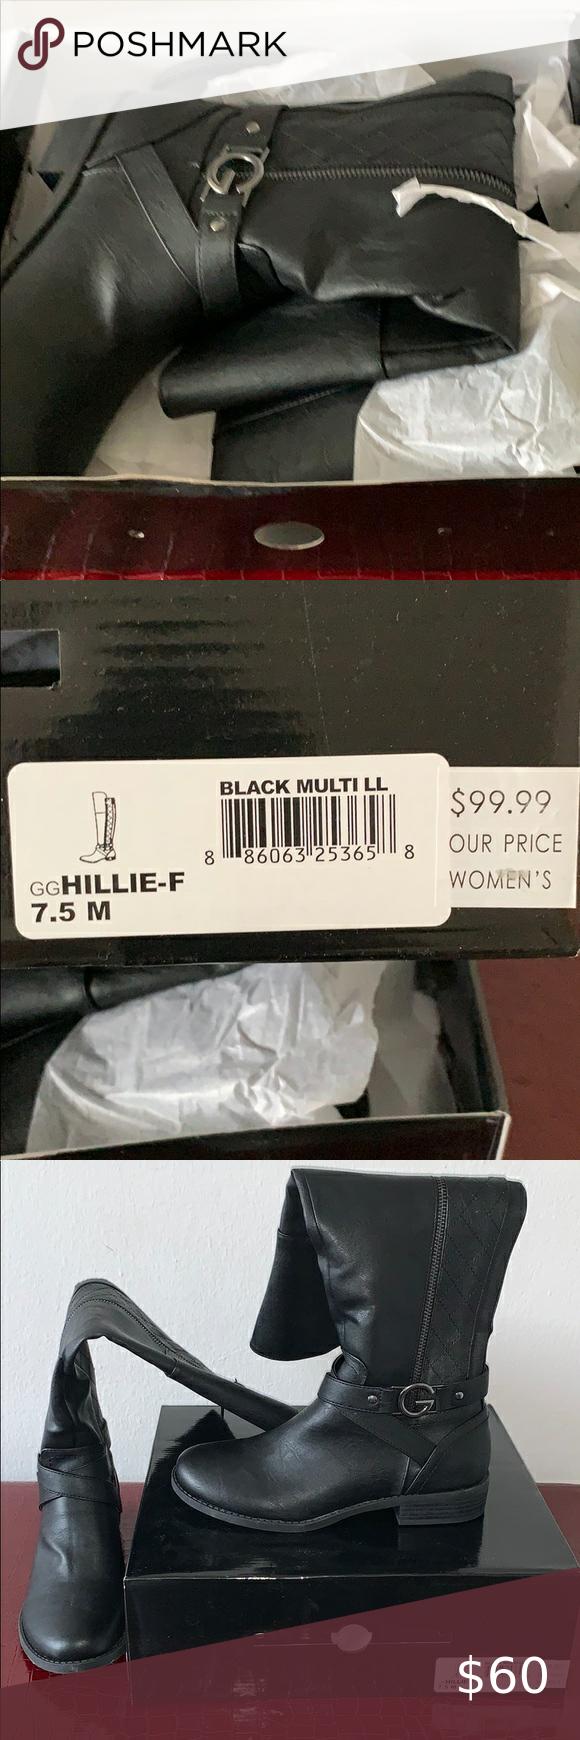 guess black multi ll boots